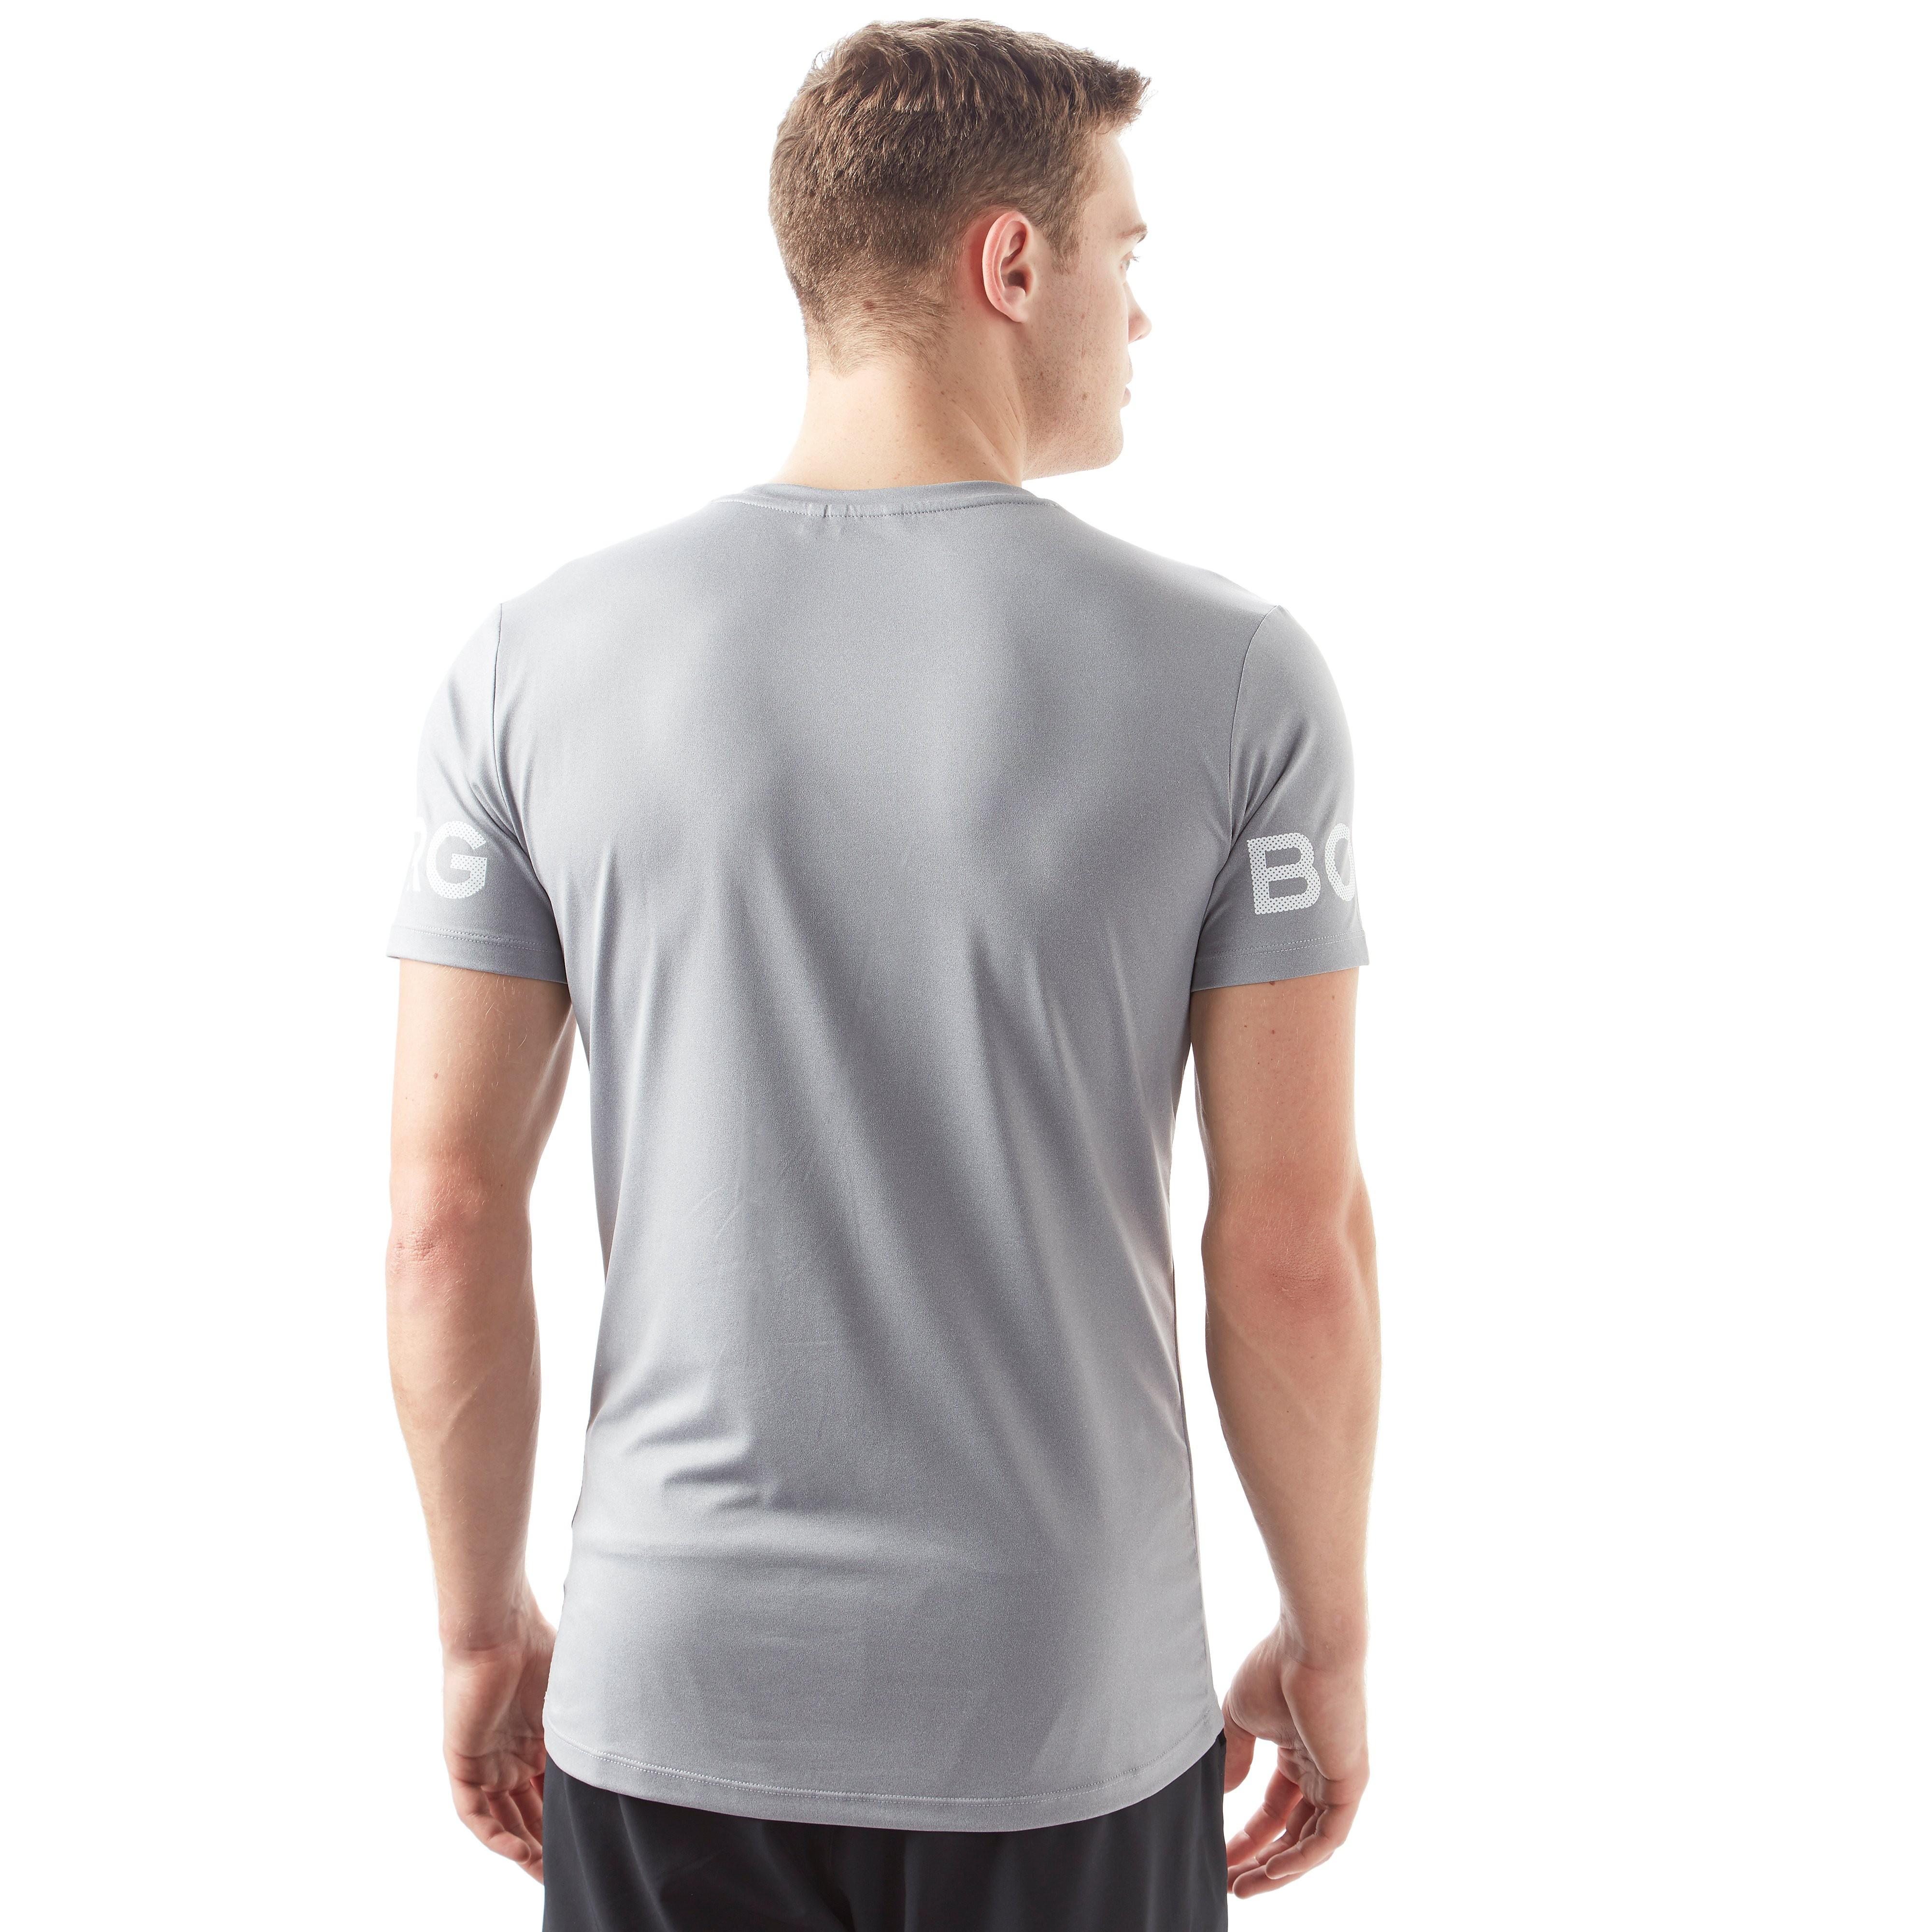 Bjorn Borg Men's Training T-Shirt